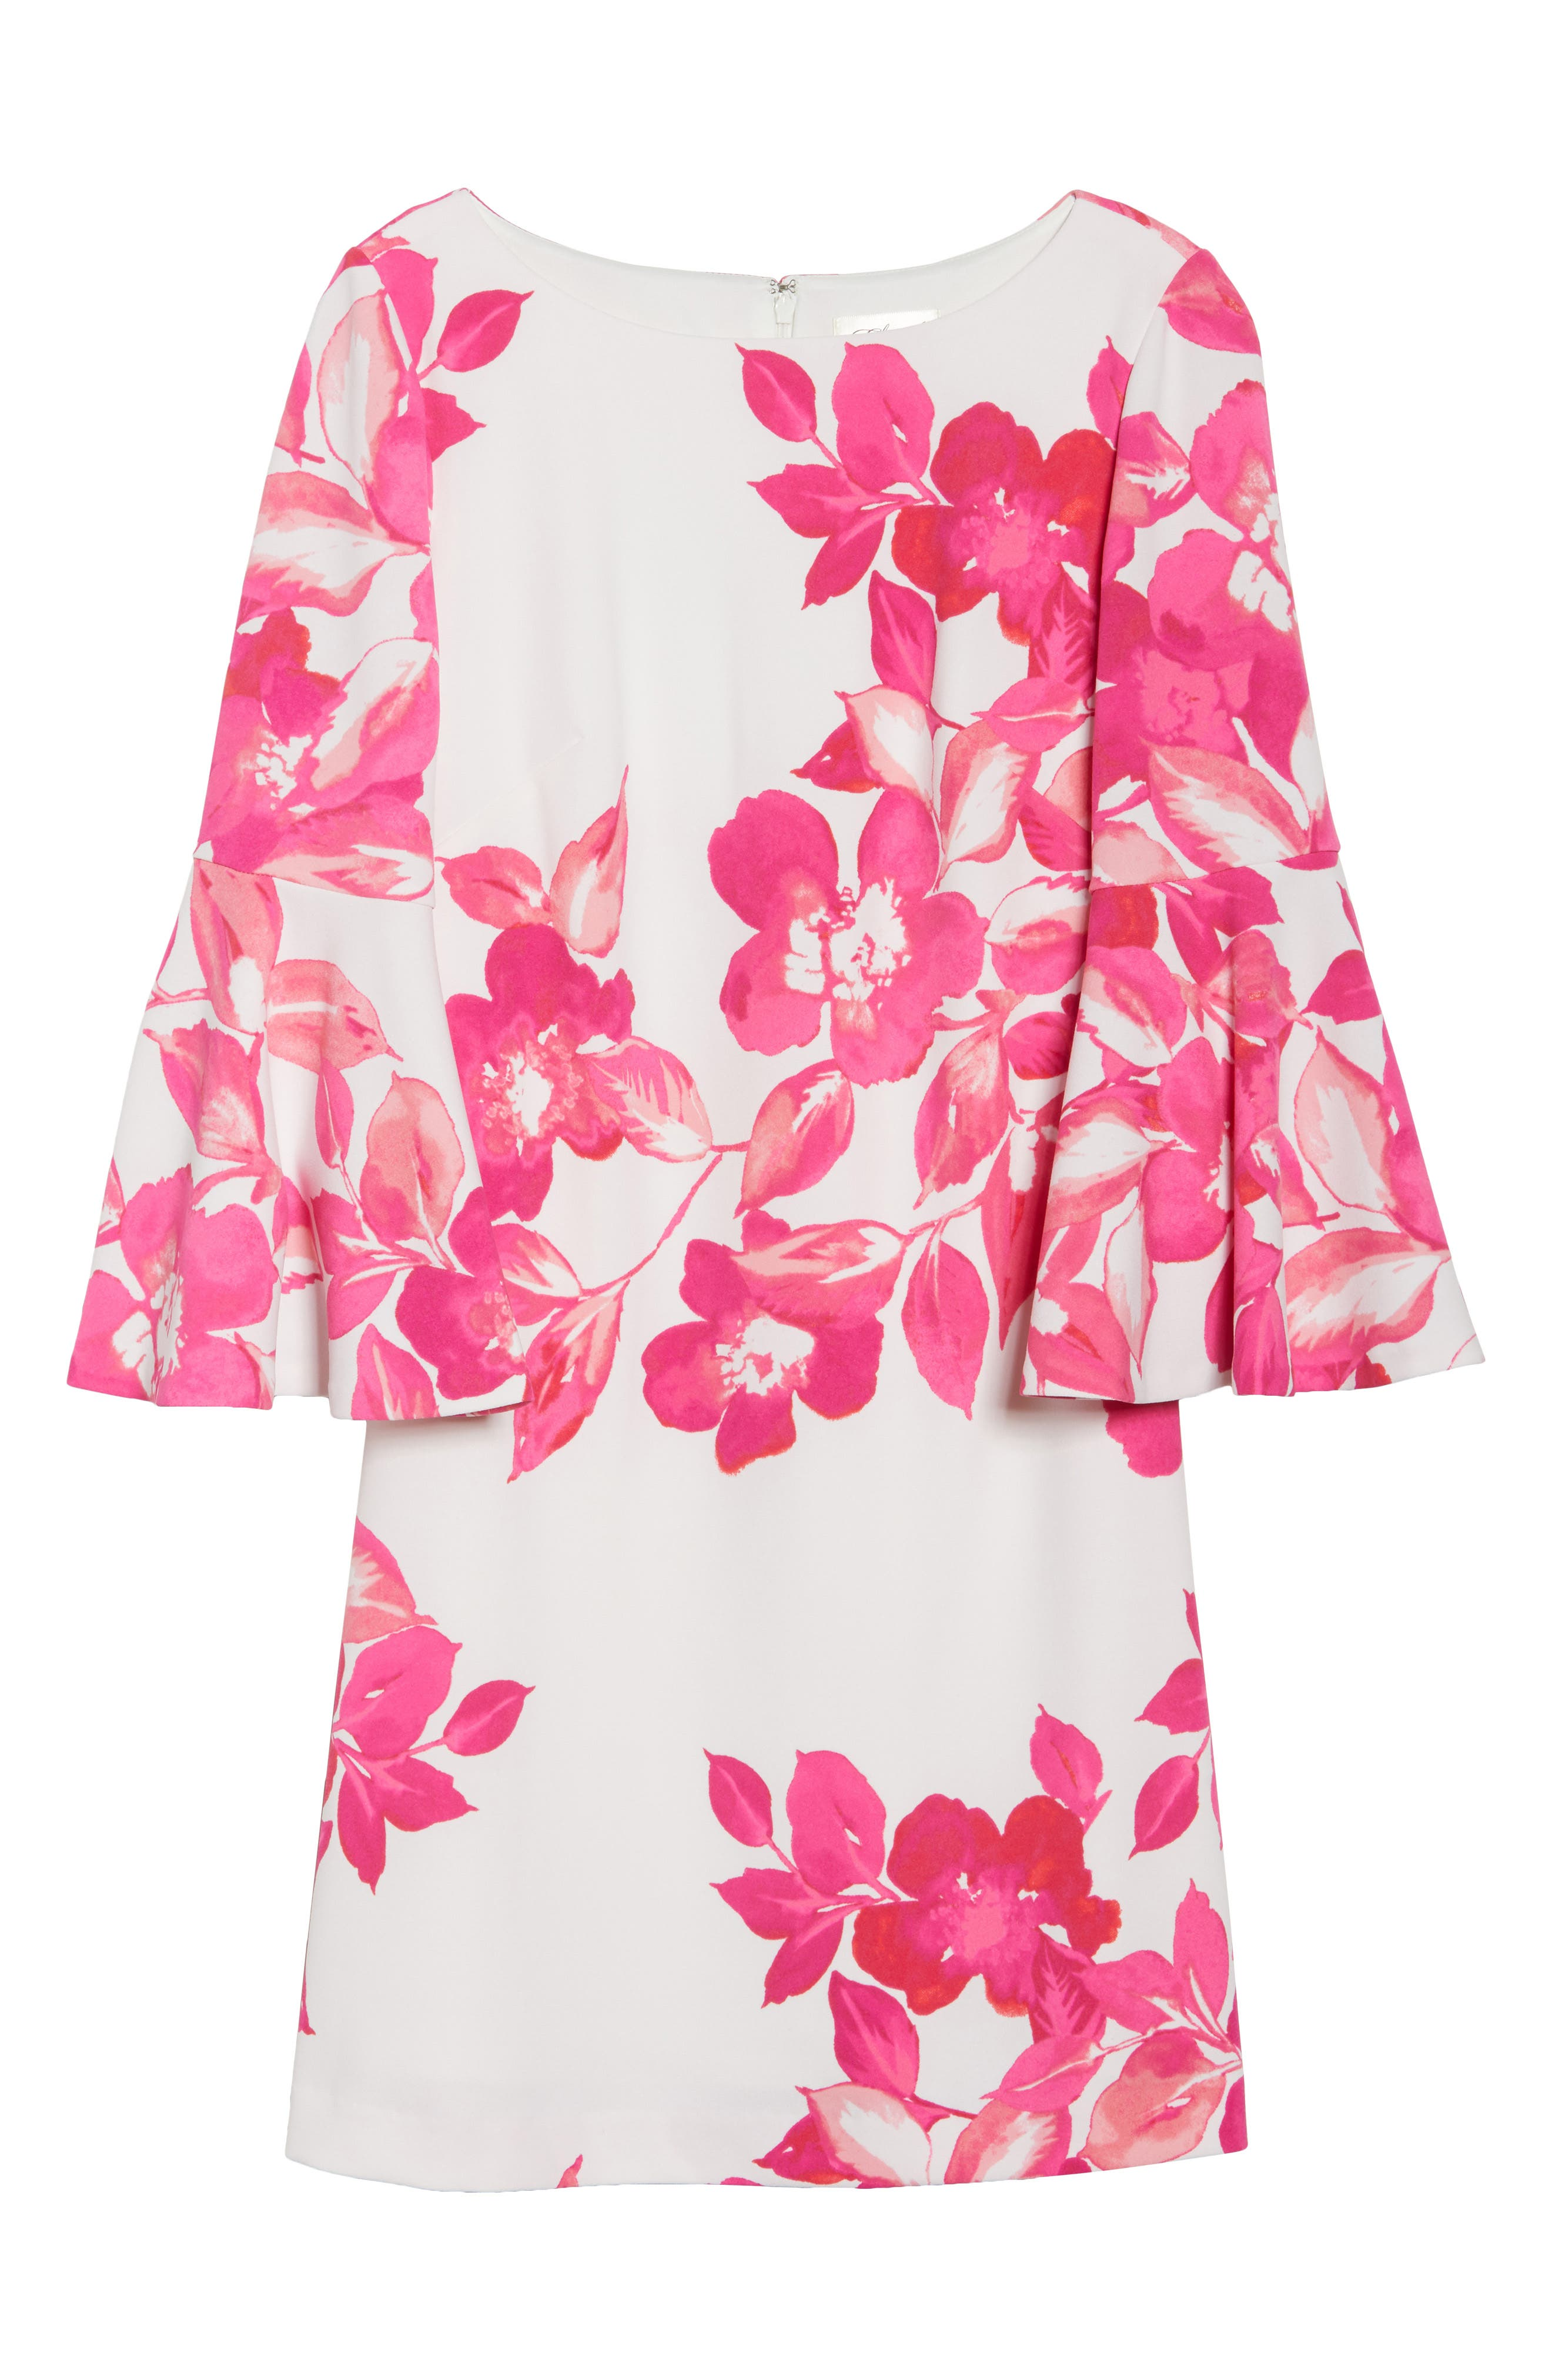 Floral Shift Dress,                             Alternate thumbnail 7, color,                             PINK